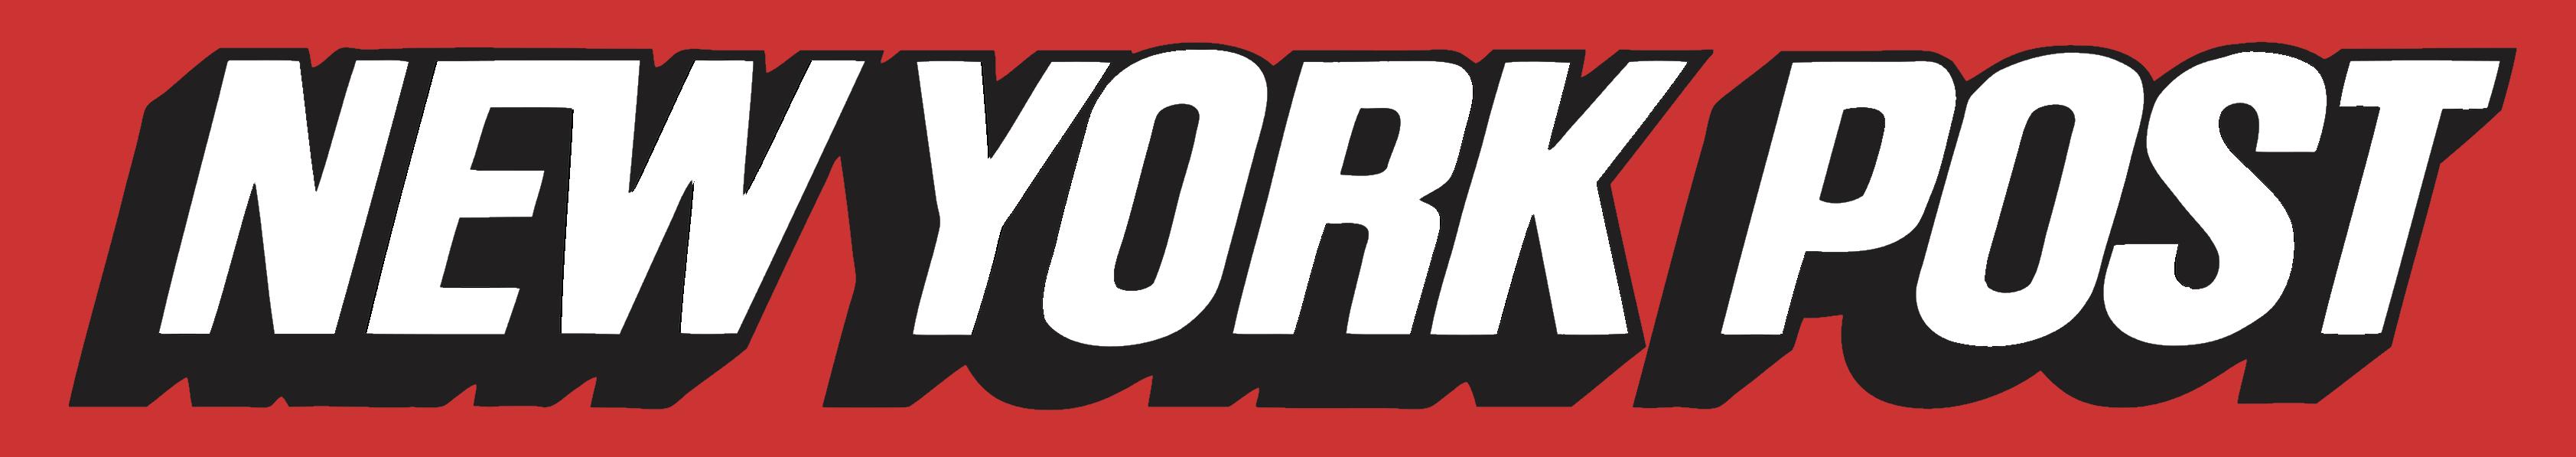 NYP_New_York_Post_logo_wordmark